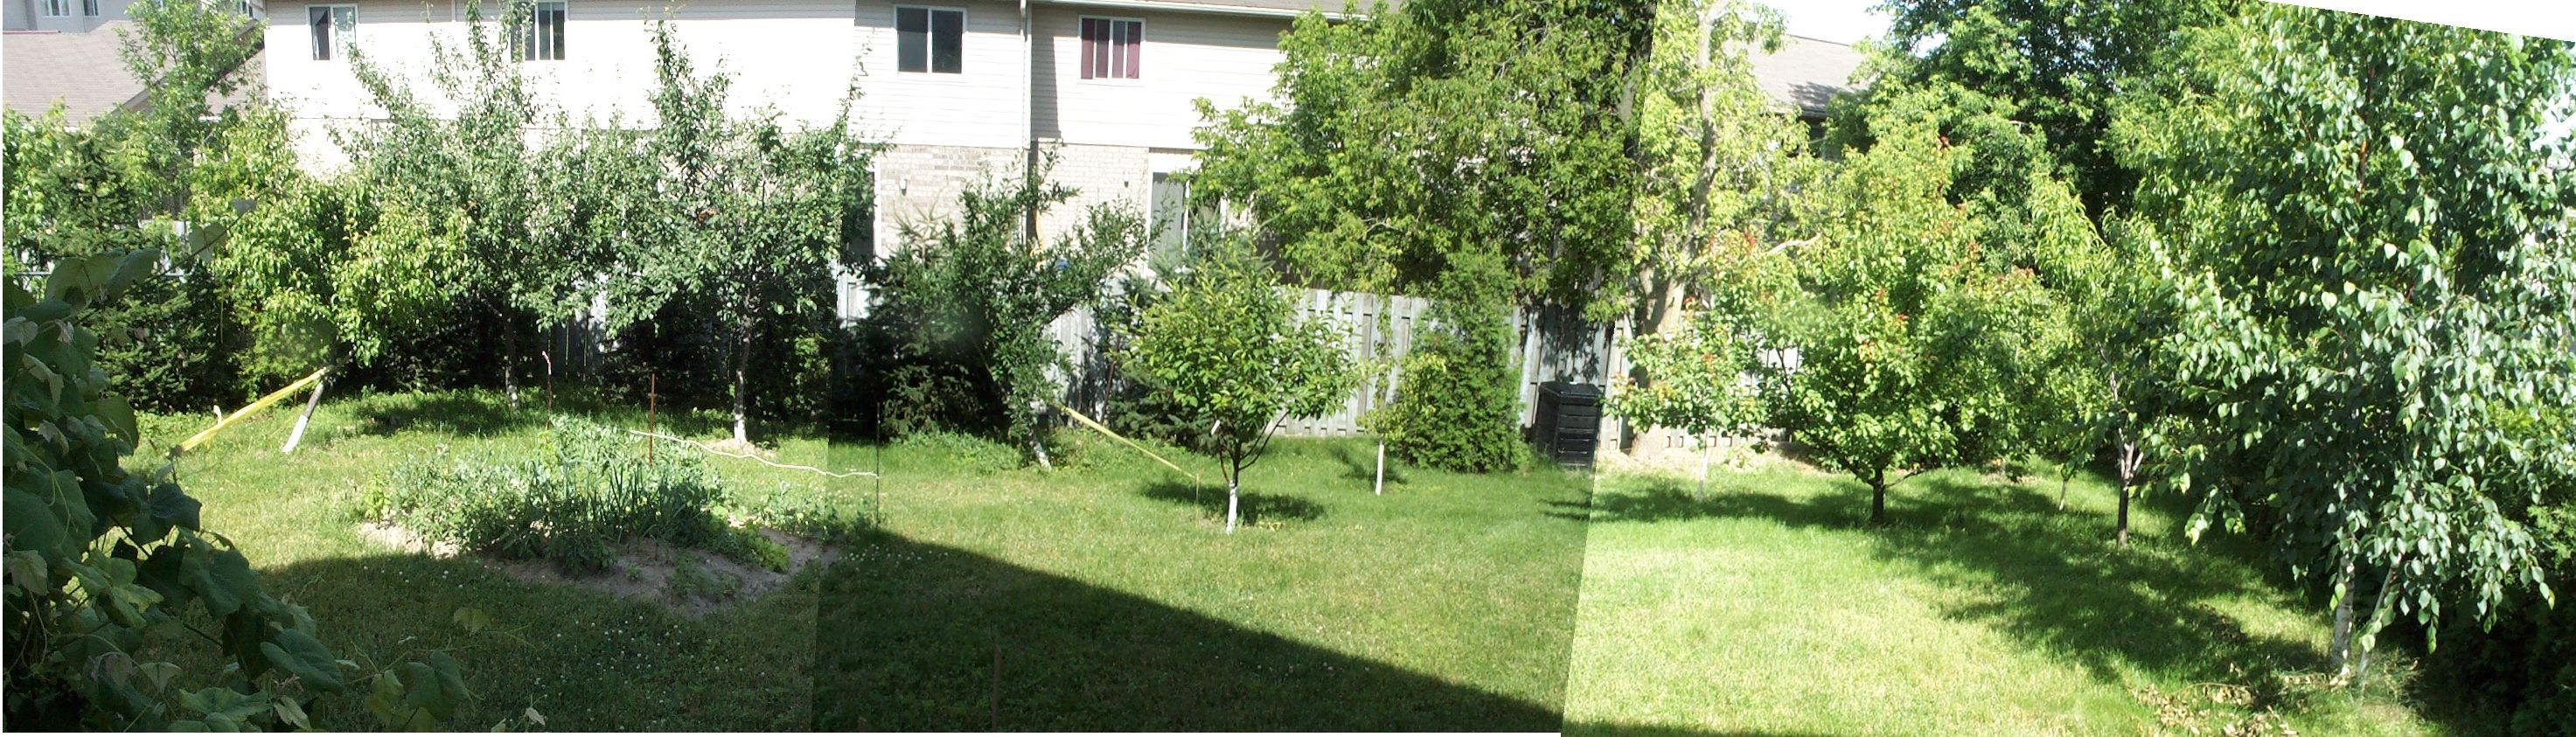 Superieur Backyard Fruit Trees